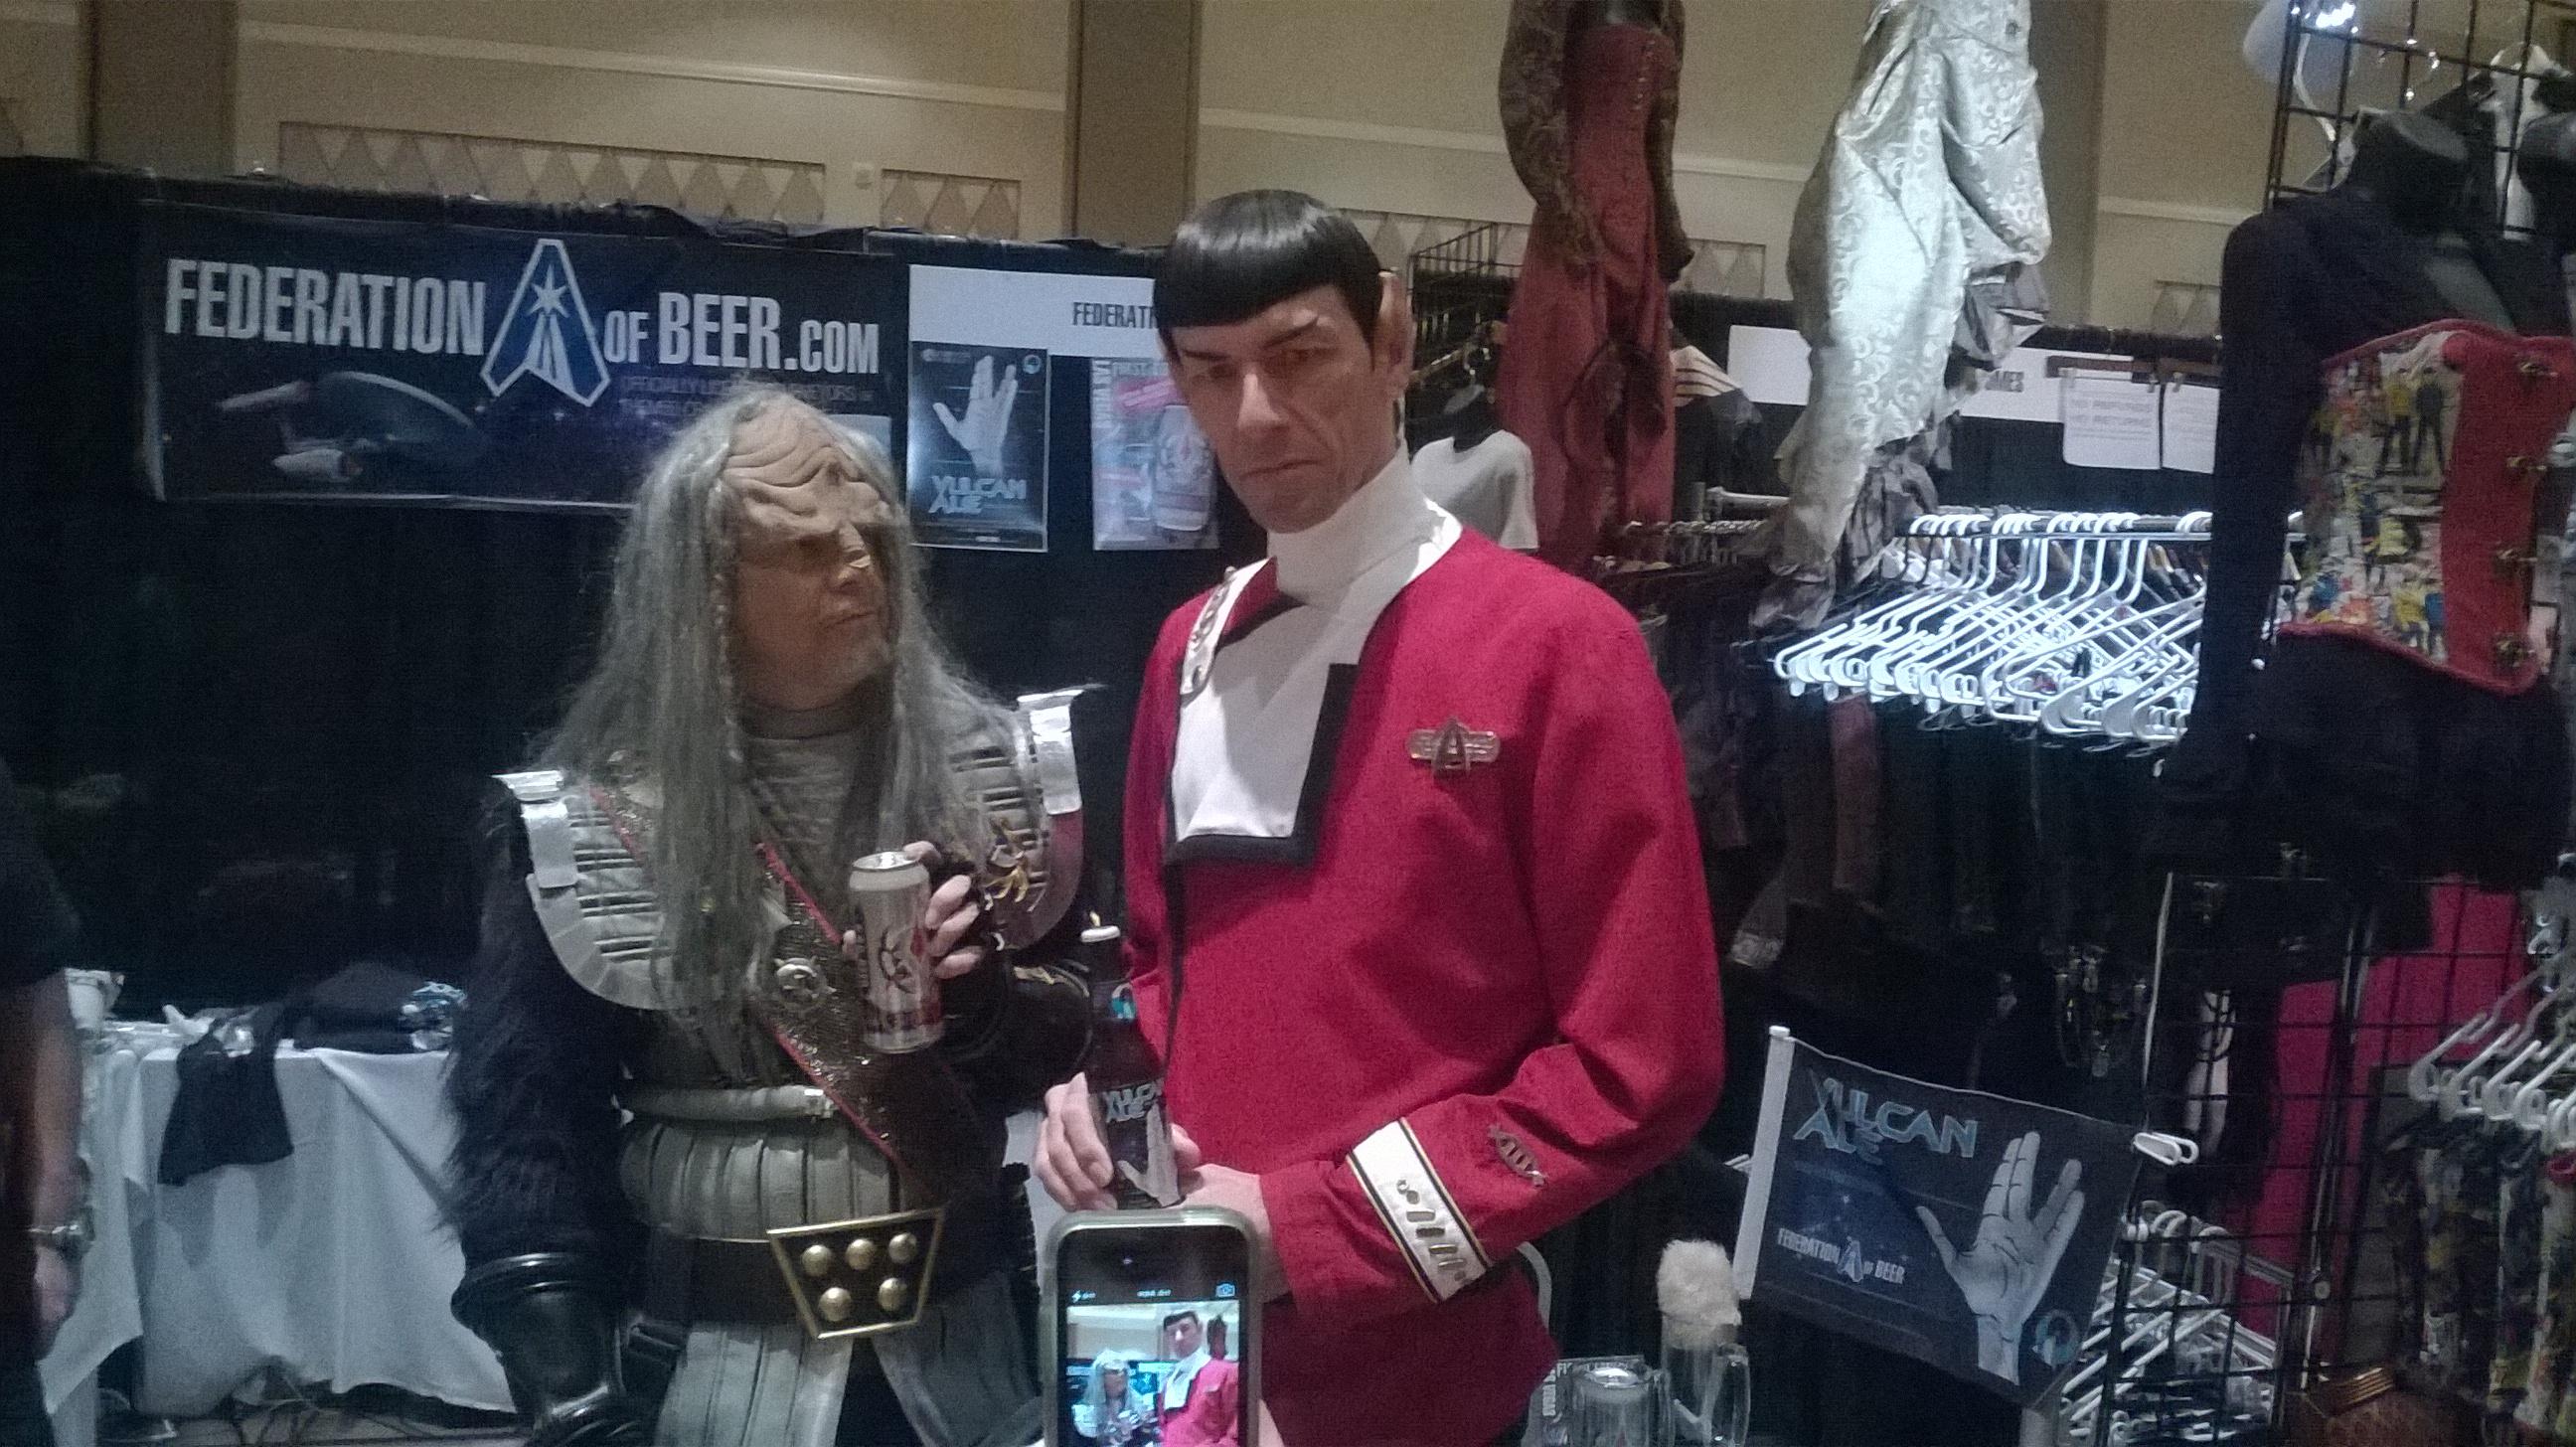 Spock visiting Federation of Beer